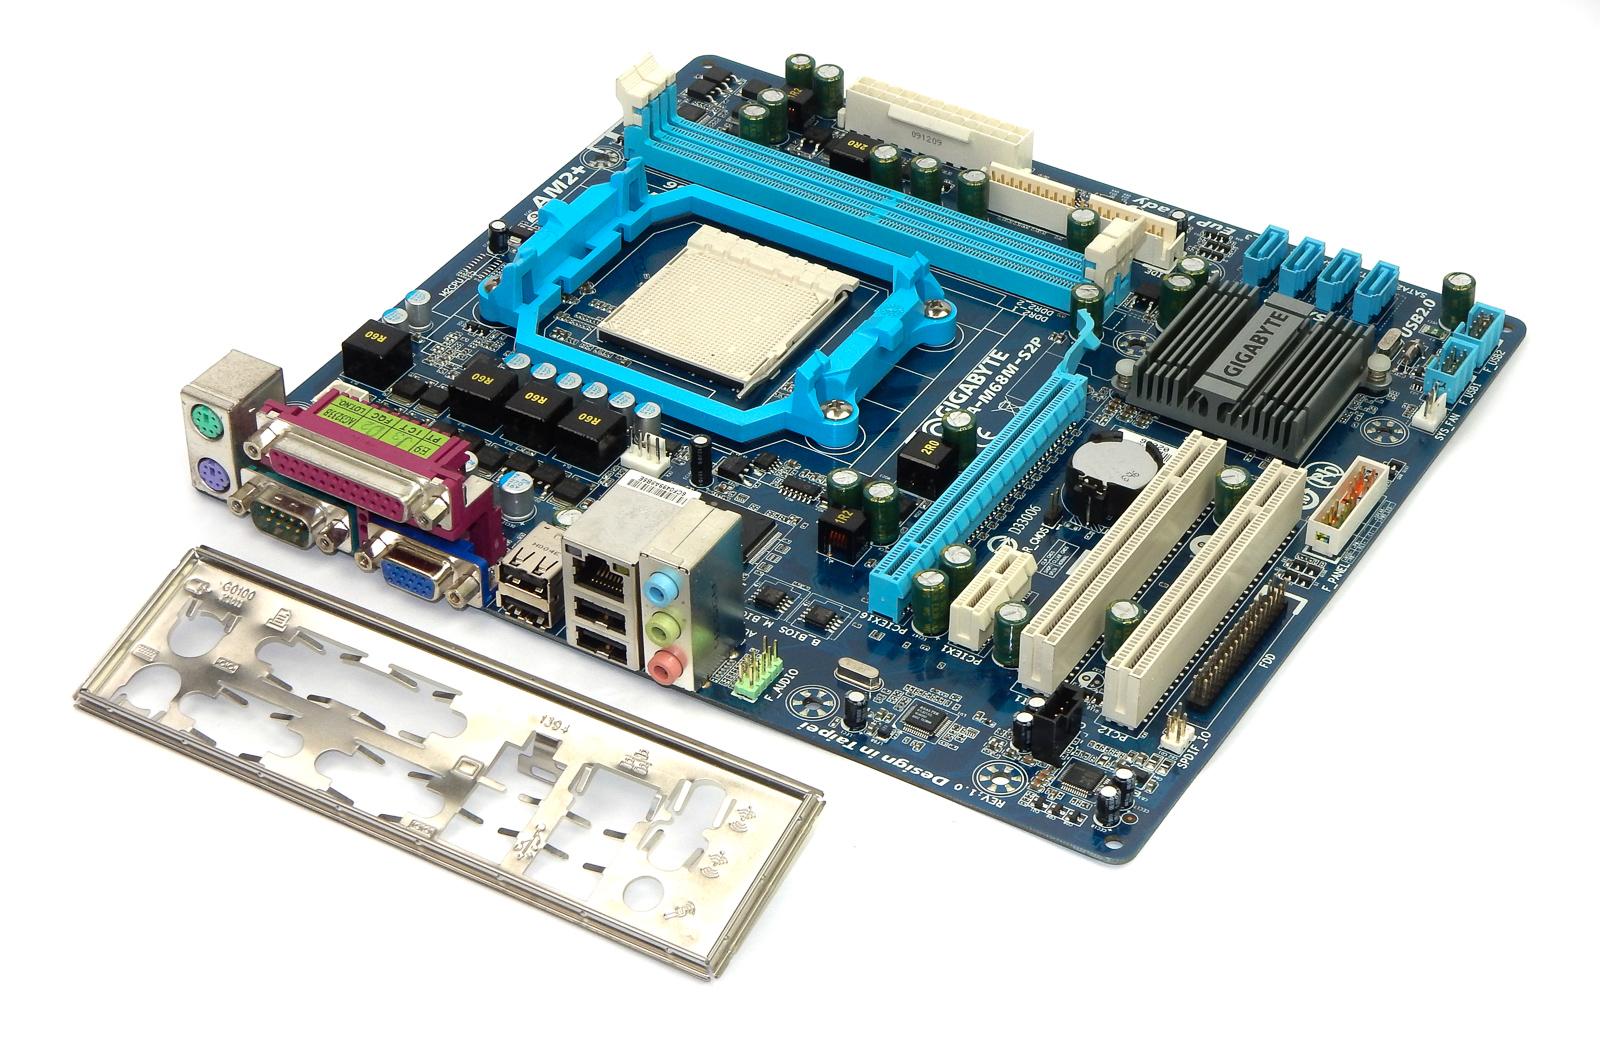 Gigabyte GA-M68MT-S2P Socket AM3 Motherboard Rev:1.0